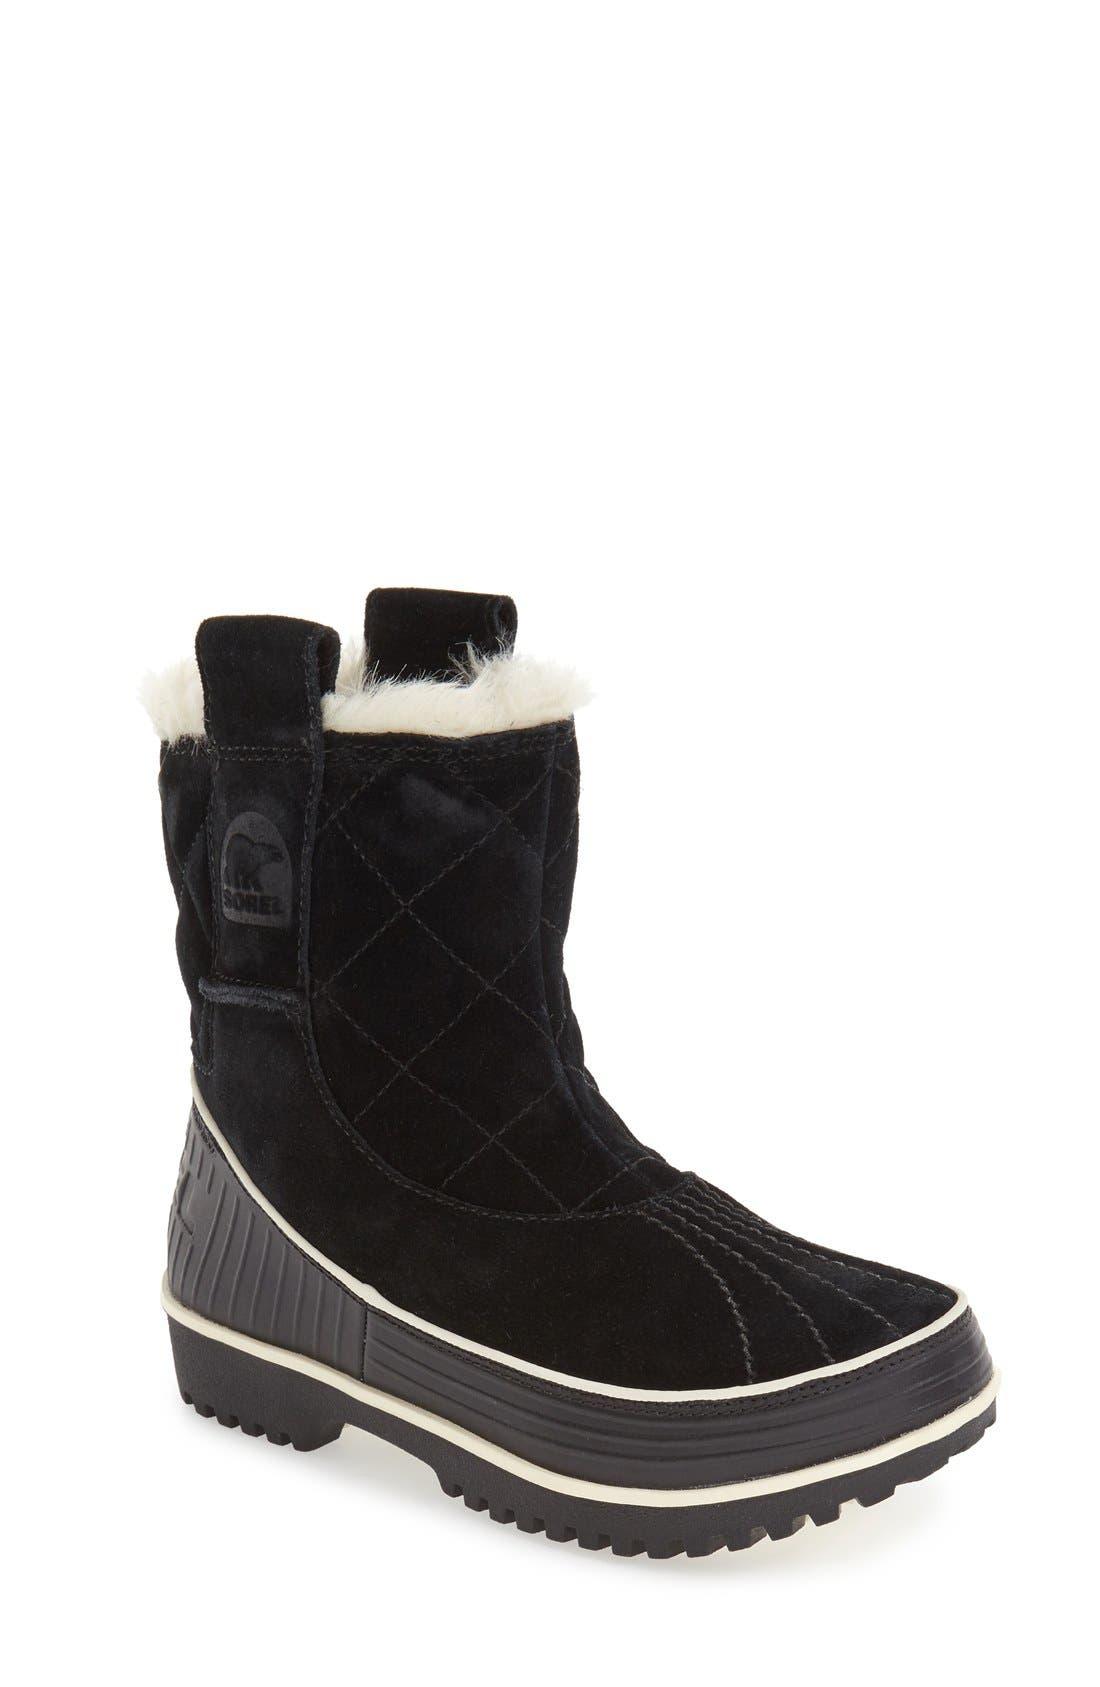 Main Image - SOREL 'Tivoli II' Waterproof Snow Boot (Women)